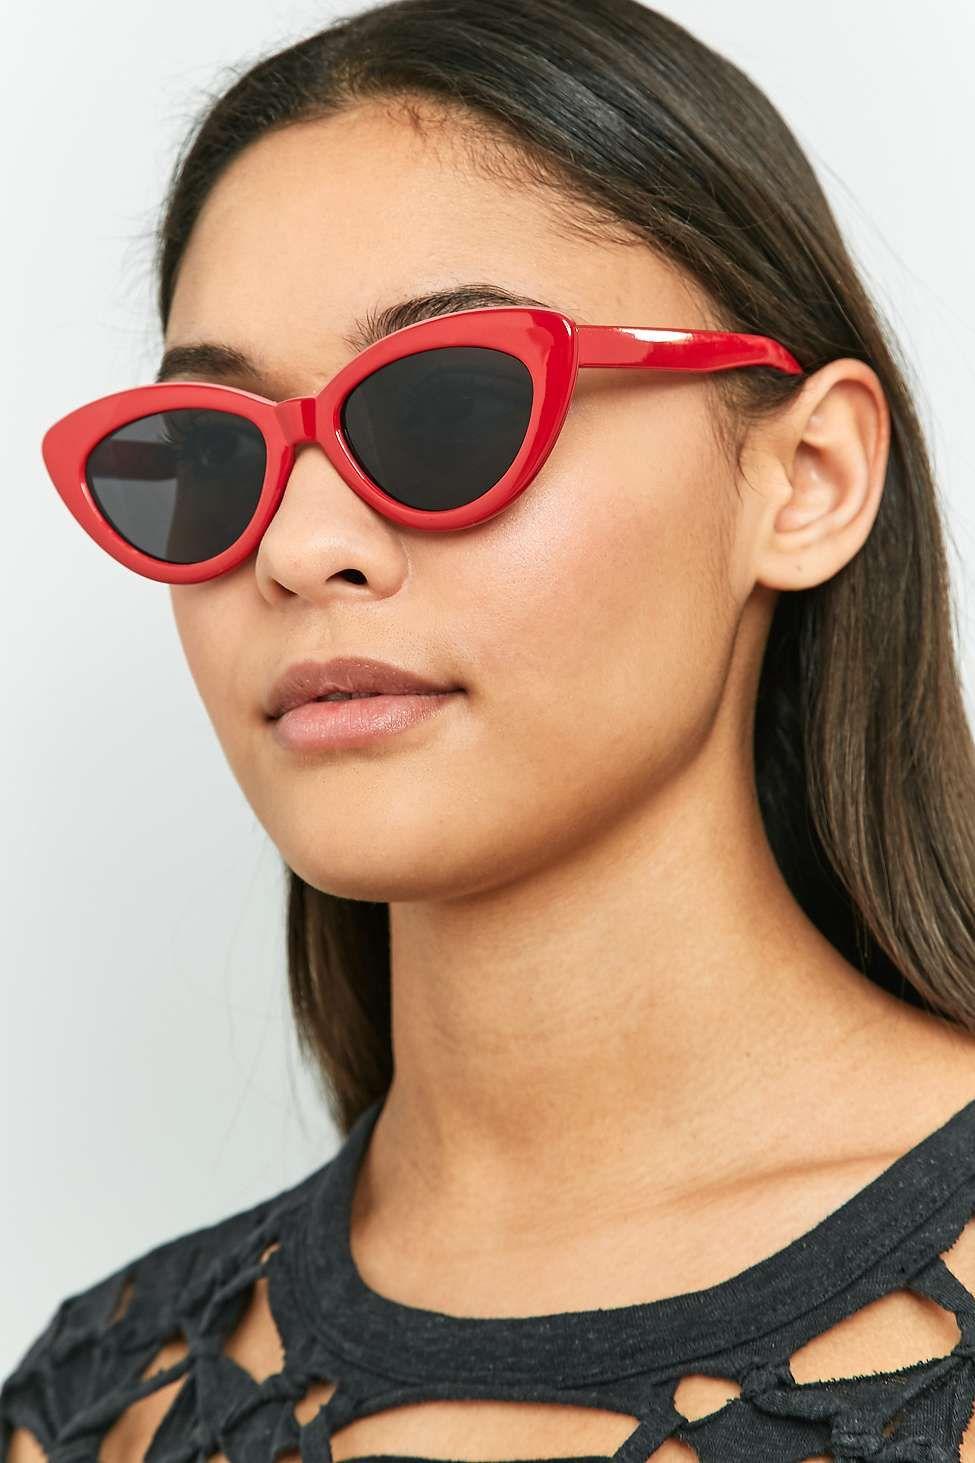 e01419b8ba677 Extreme Cat Eye Sunglasses - Urban Outfitters